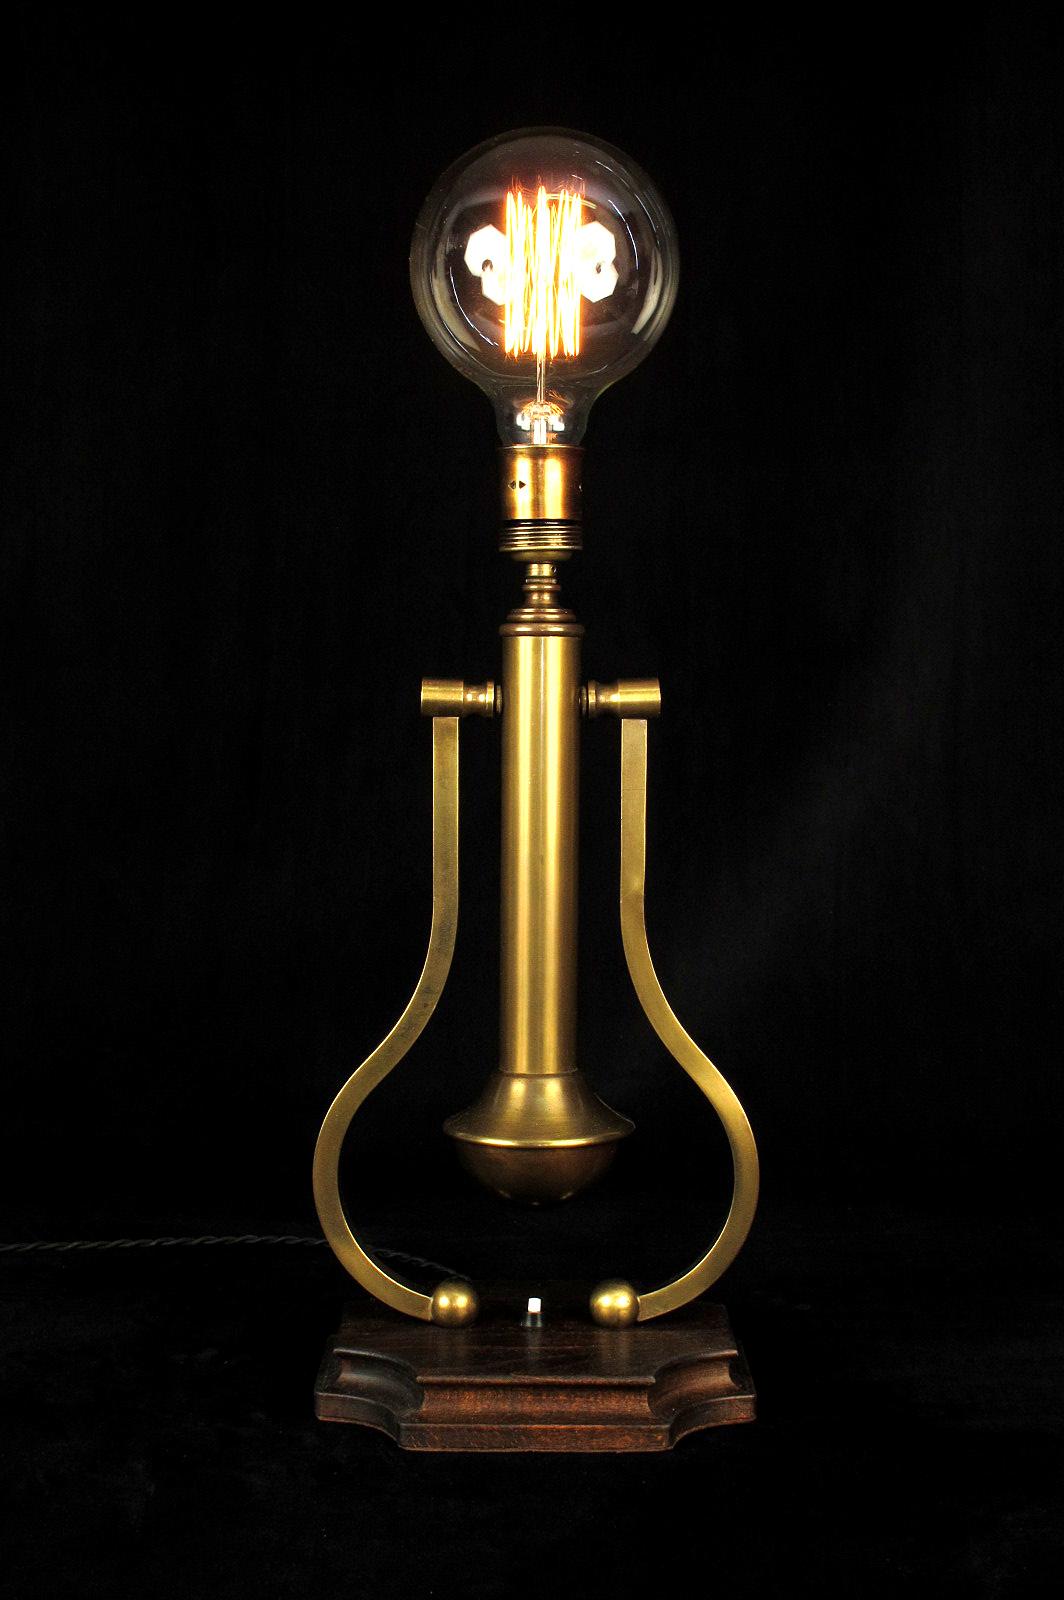 ancienne lampe de bureau pour bateau old school bazaar. Black Bedroom Furniture Sets. Home Design Ideas